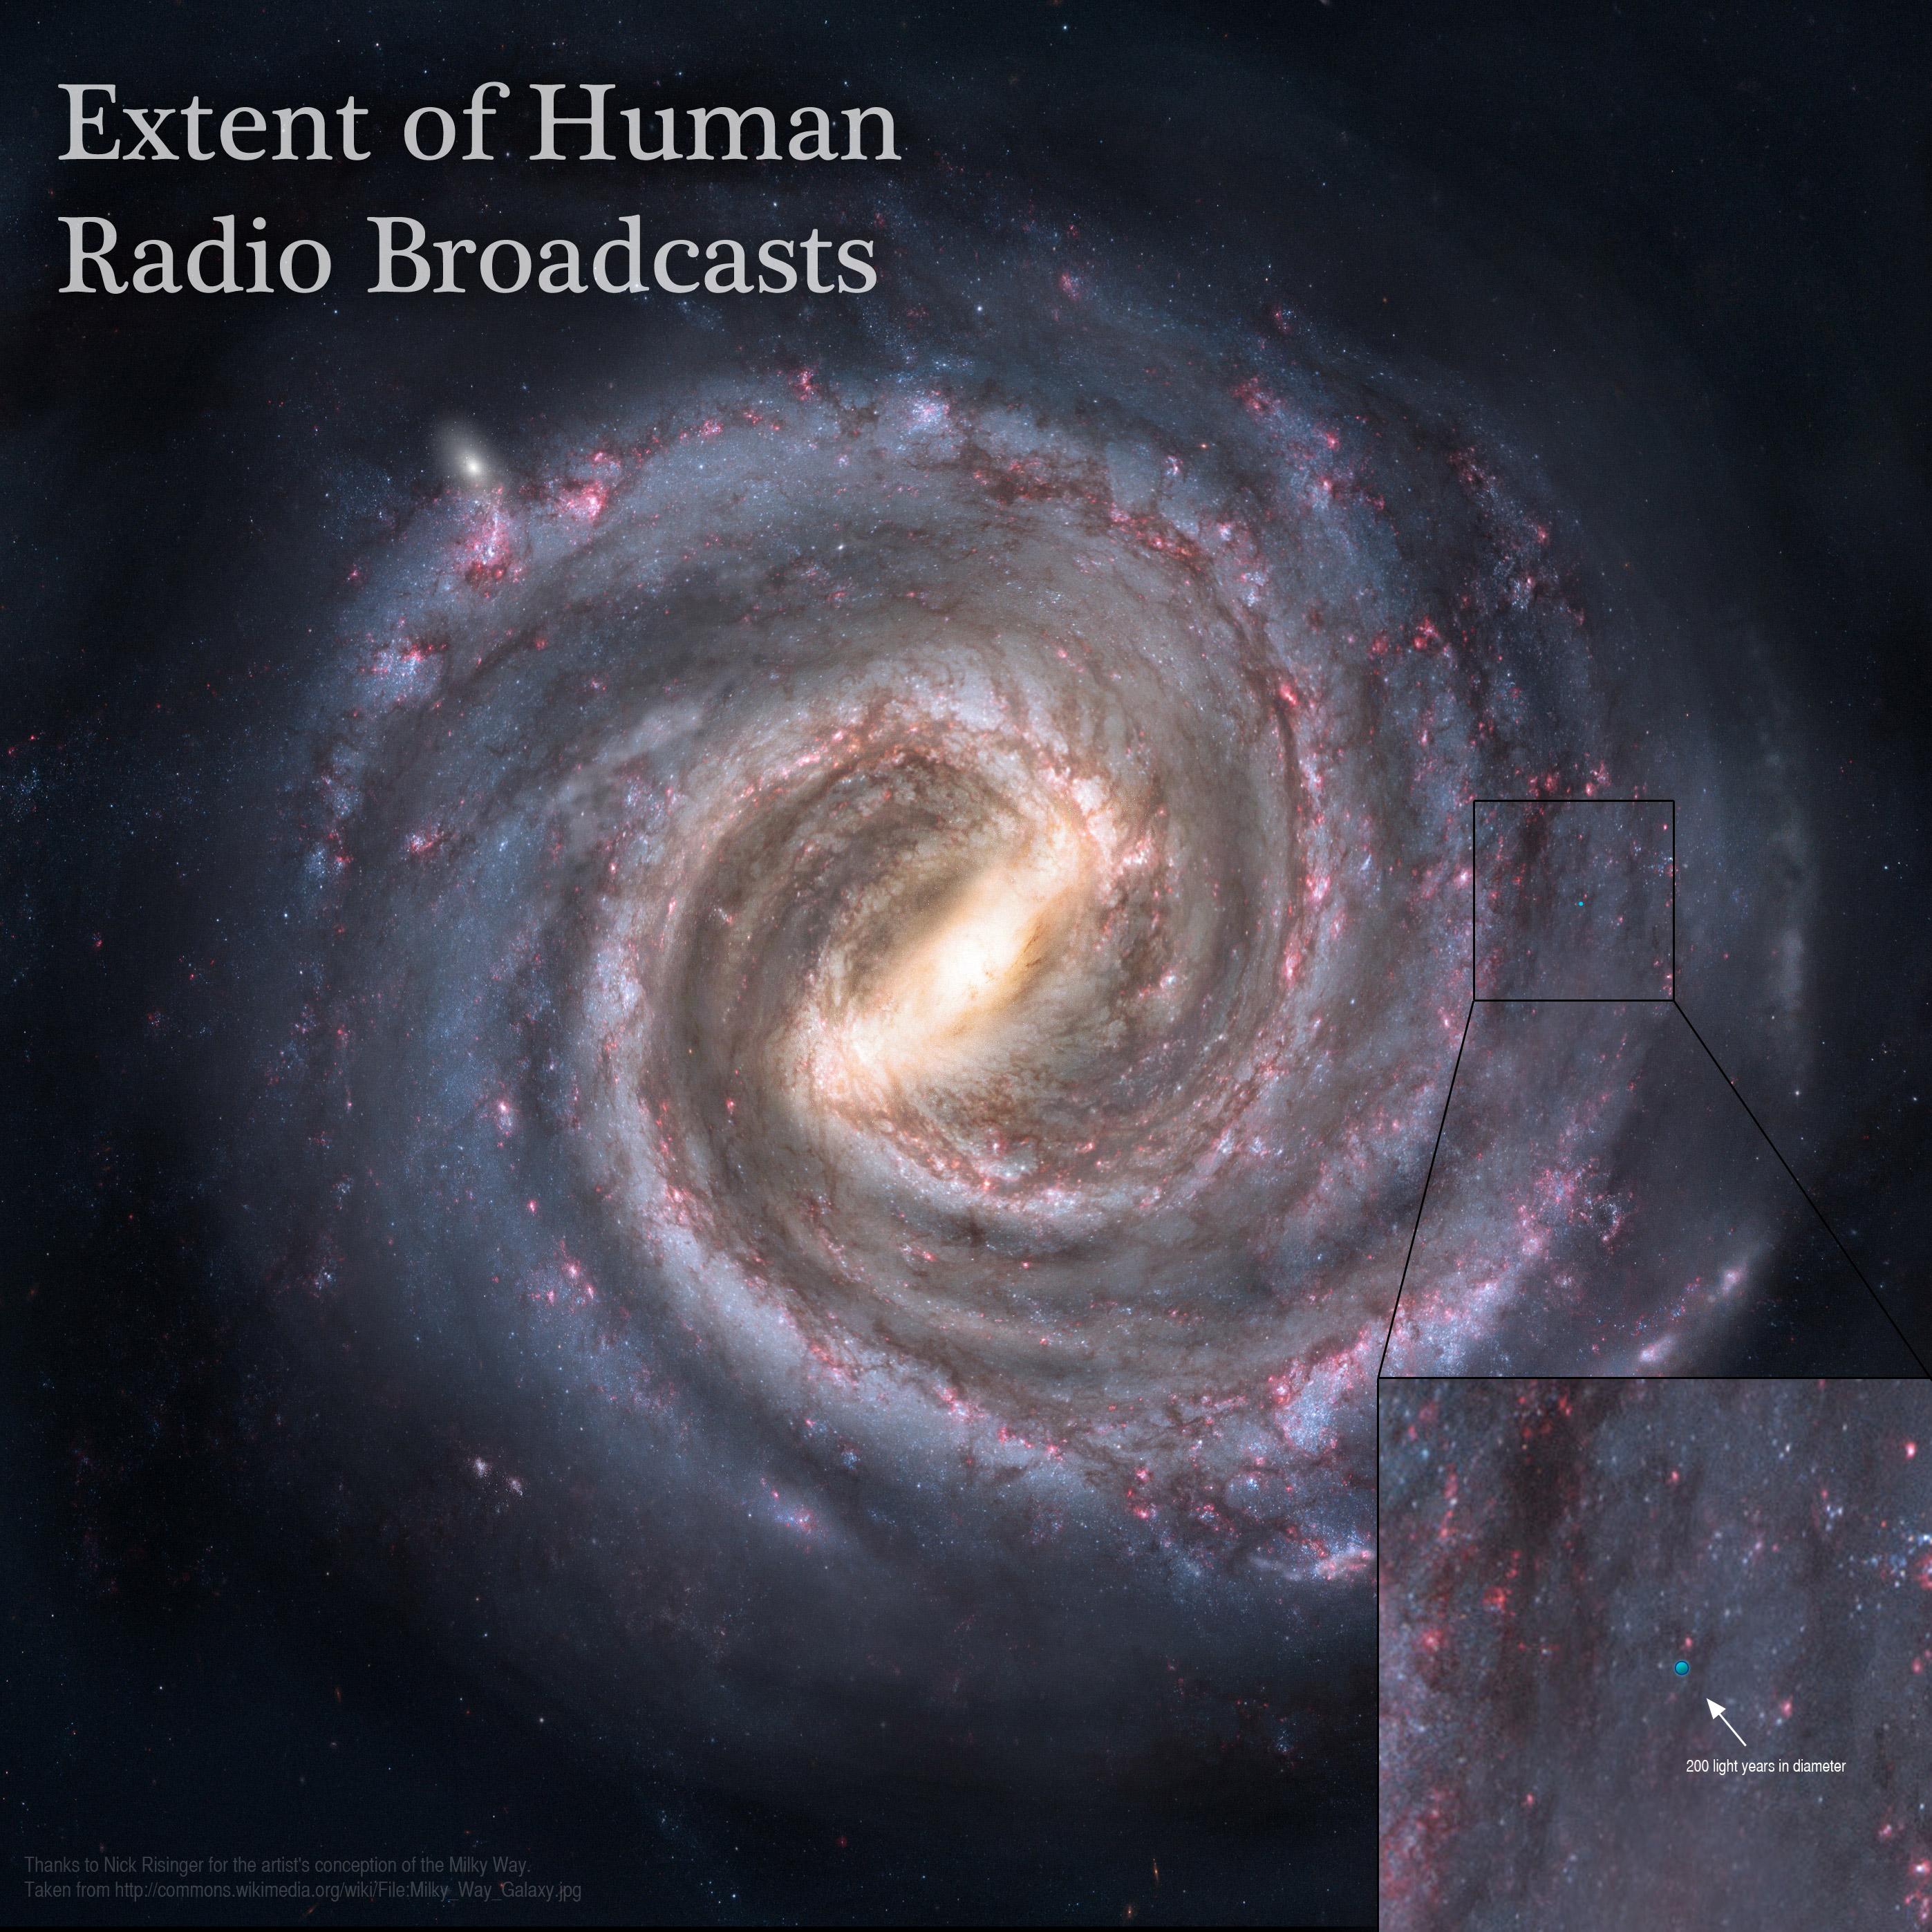 Extent of human radio broadcasts